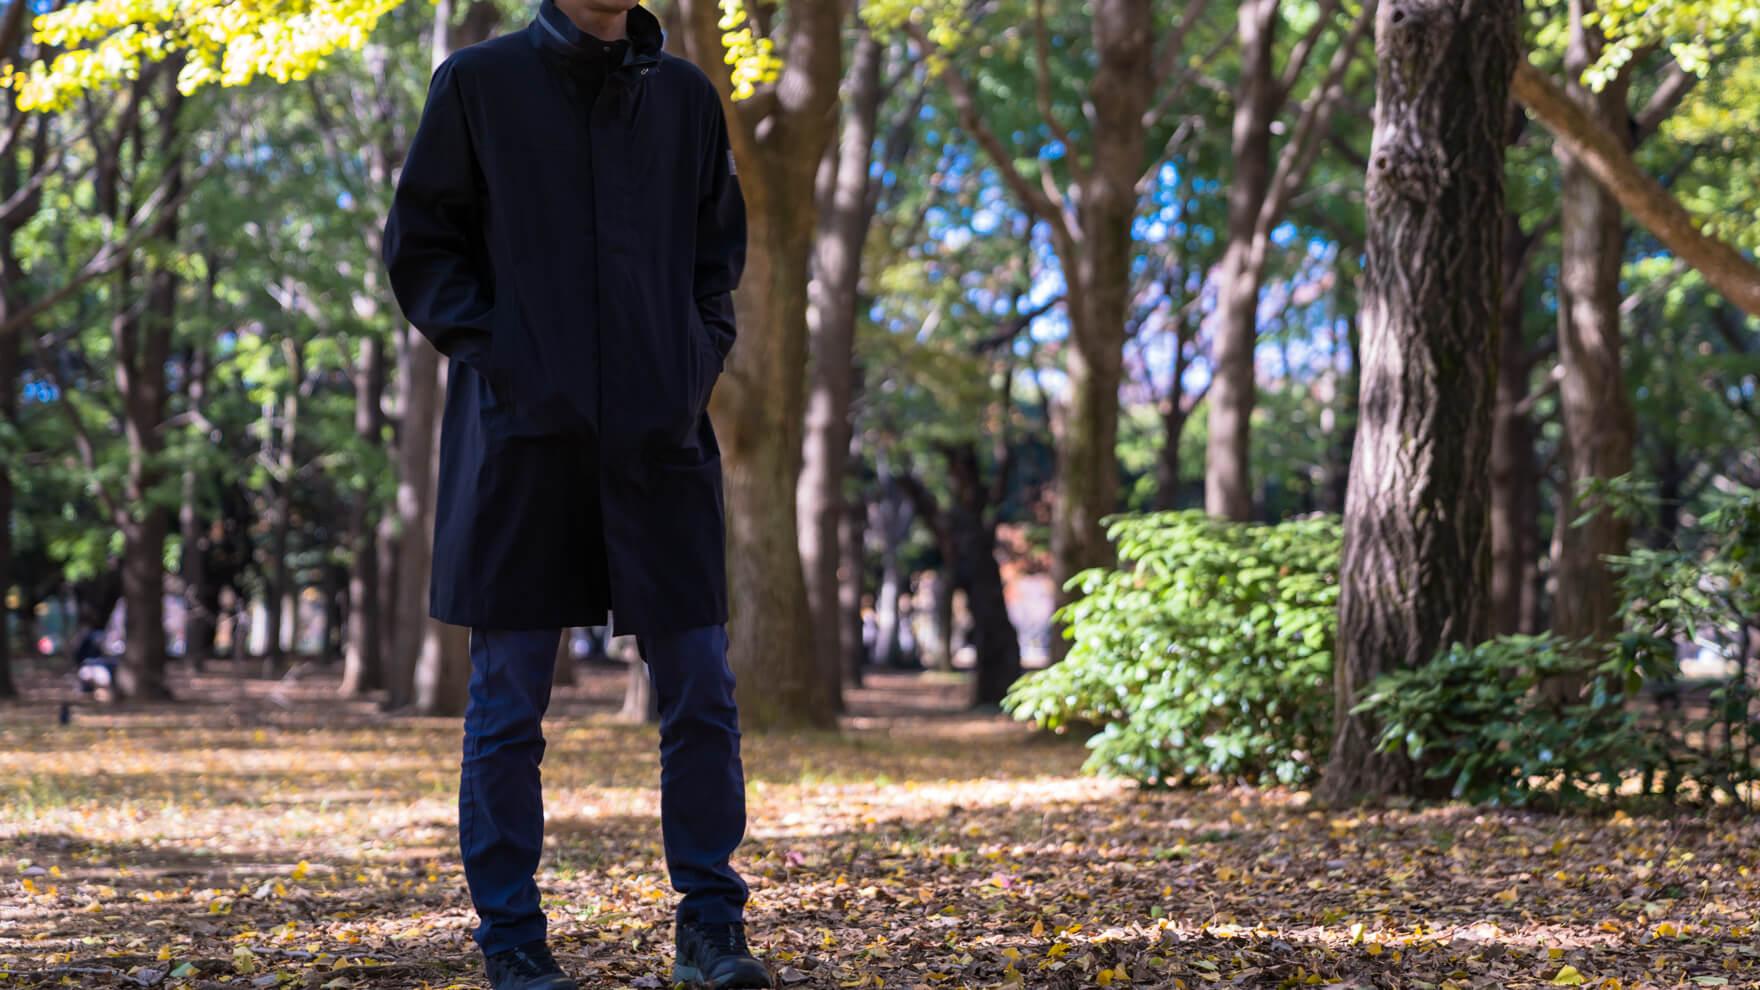 Review:街着の顔して中身は超本格。F/ACSION KENROKUは都会と自然をシームレスに行き来する人に似合う服